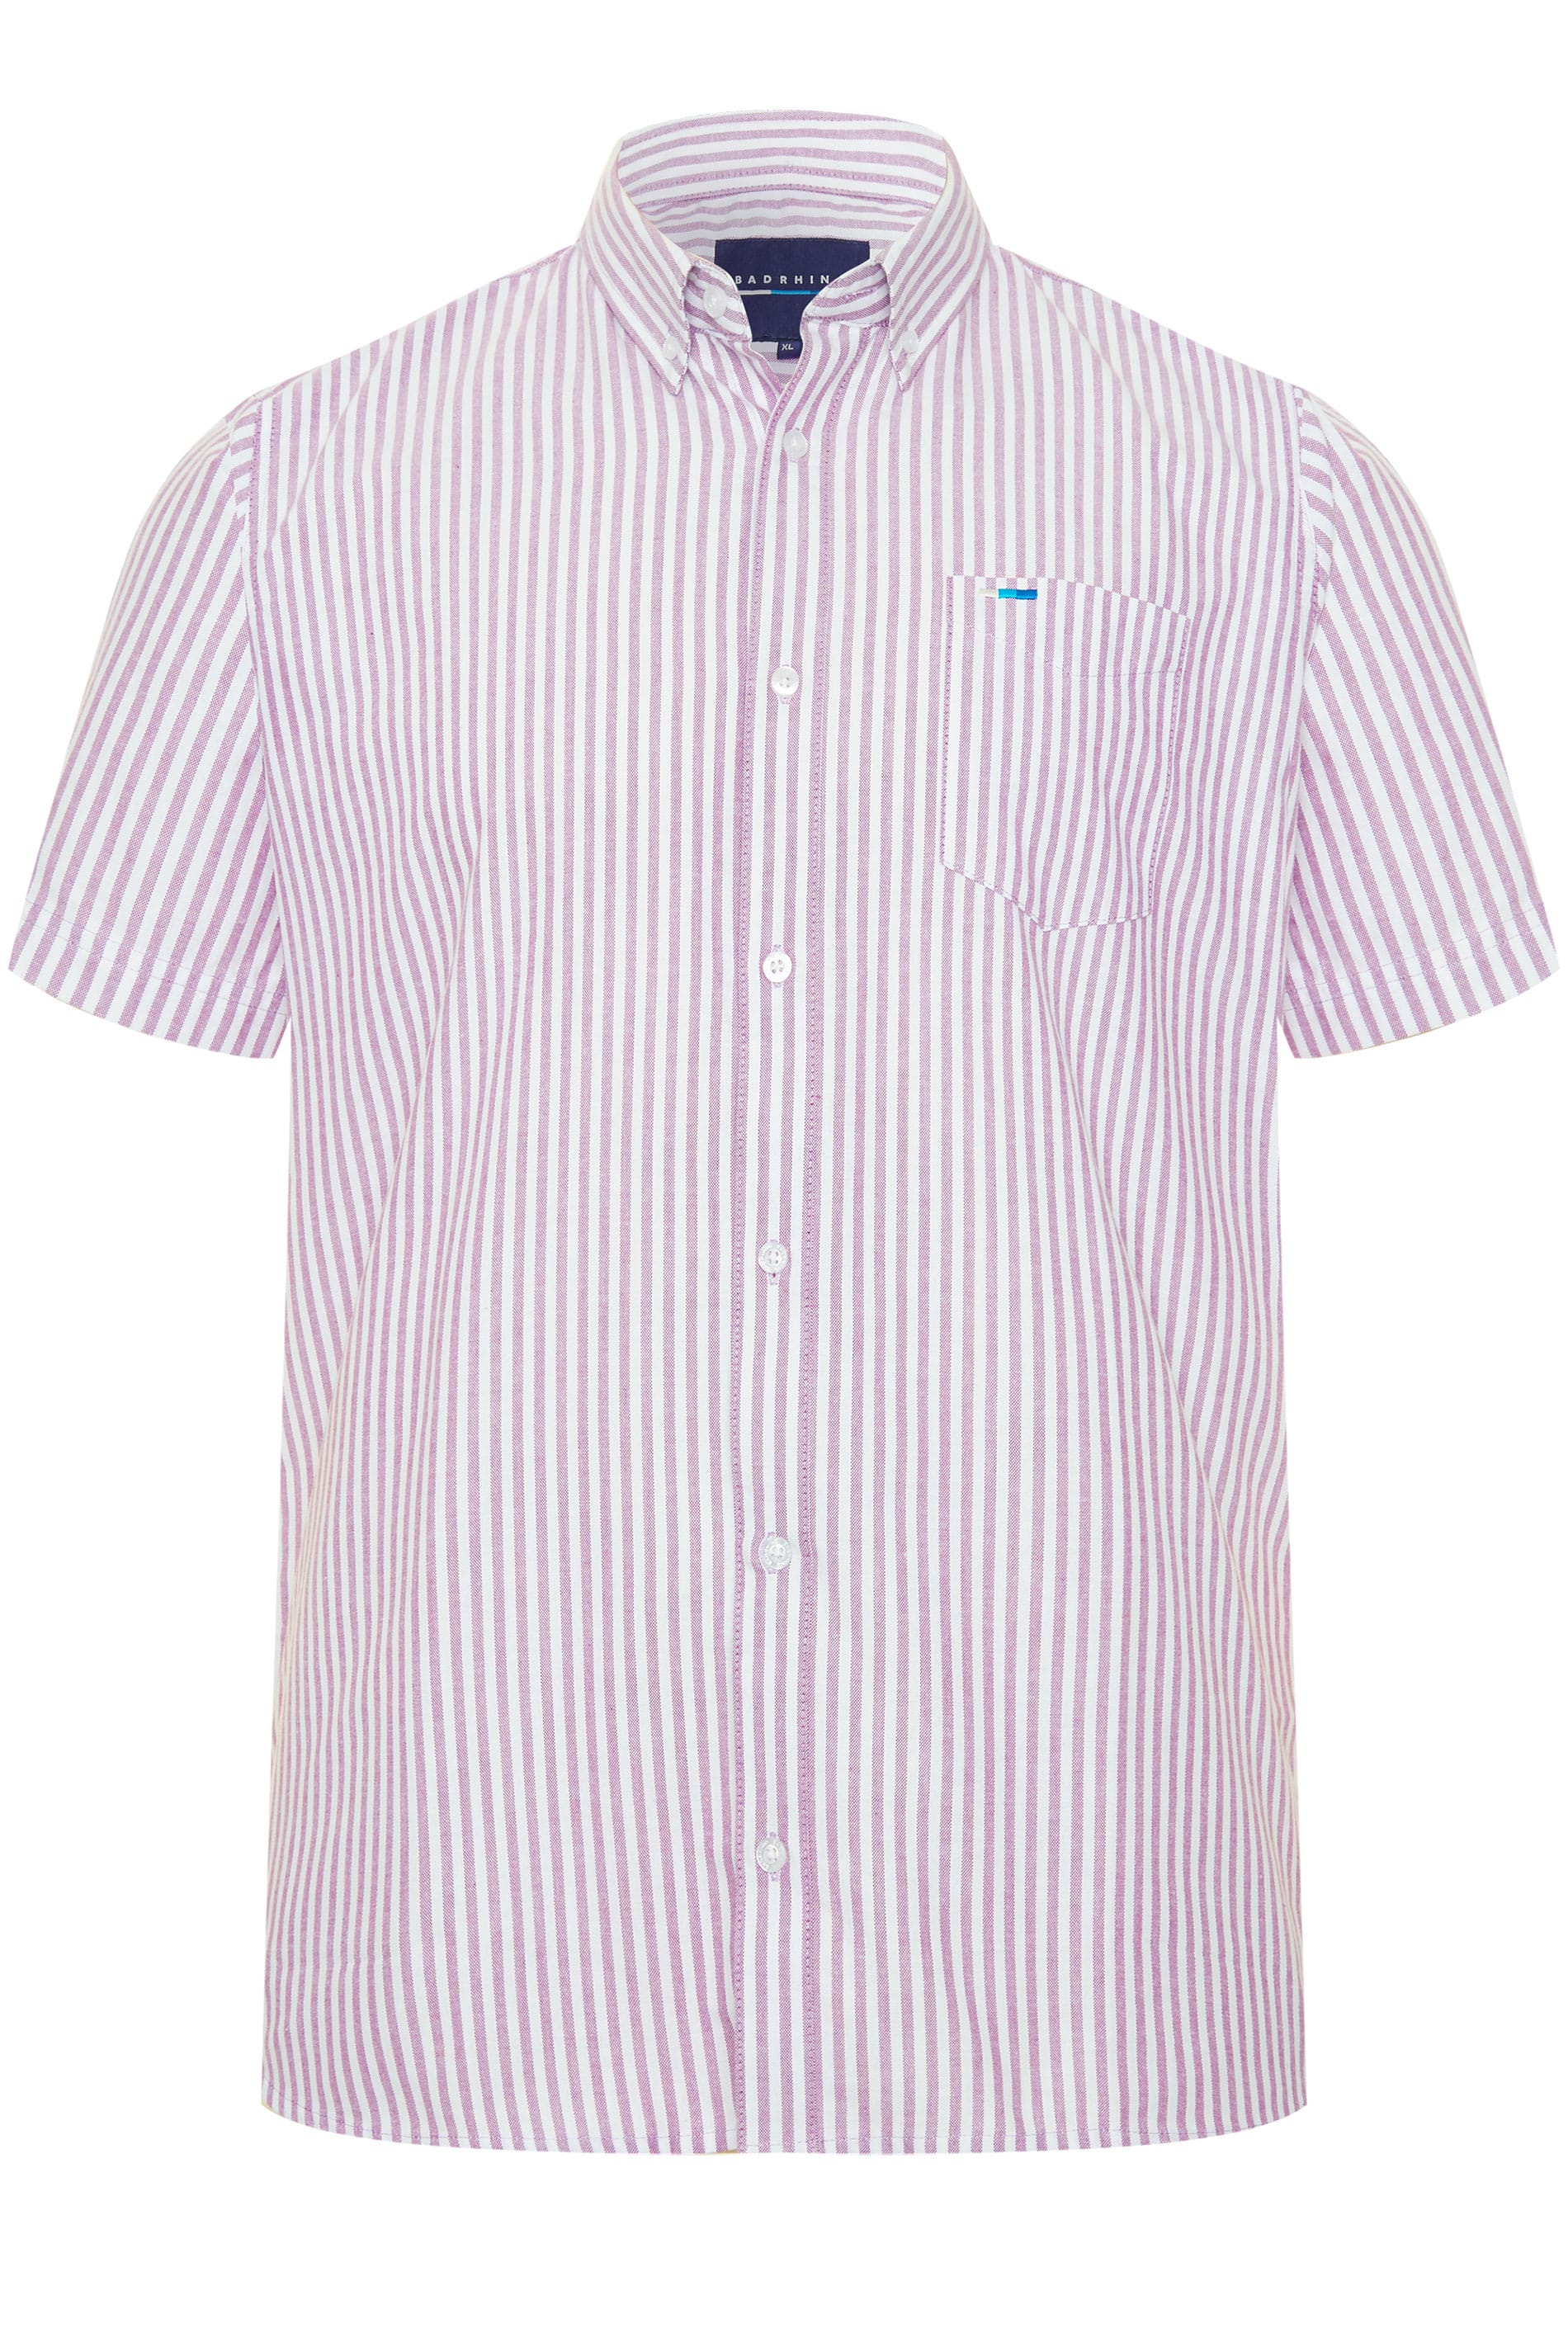 BadRhino Lilac Striped Short Sleeved Oxford Shirt_ffa6.jpg